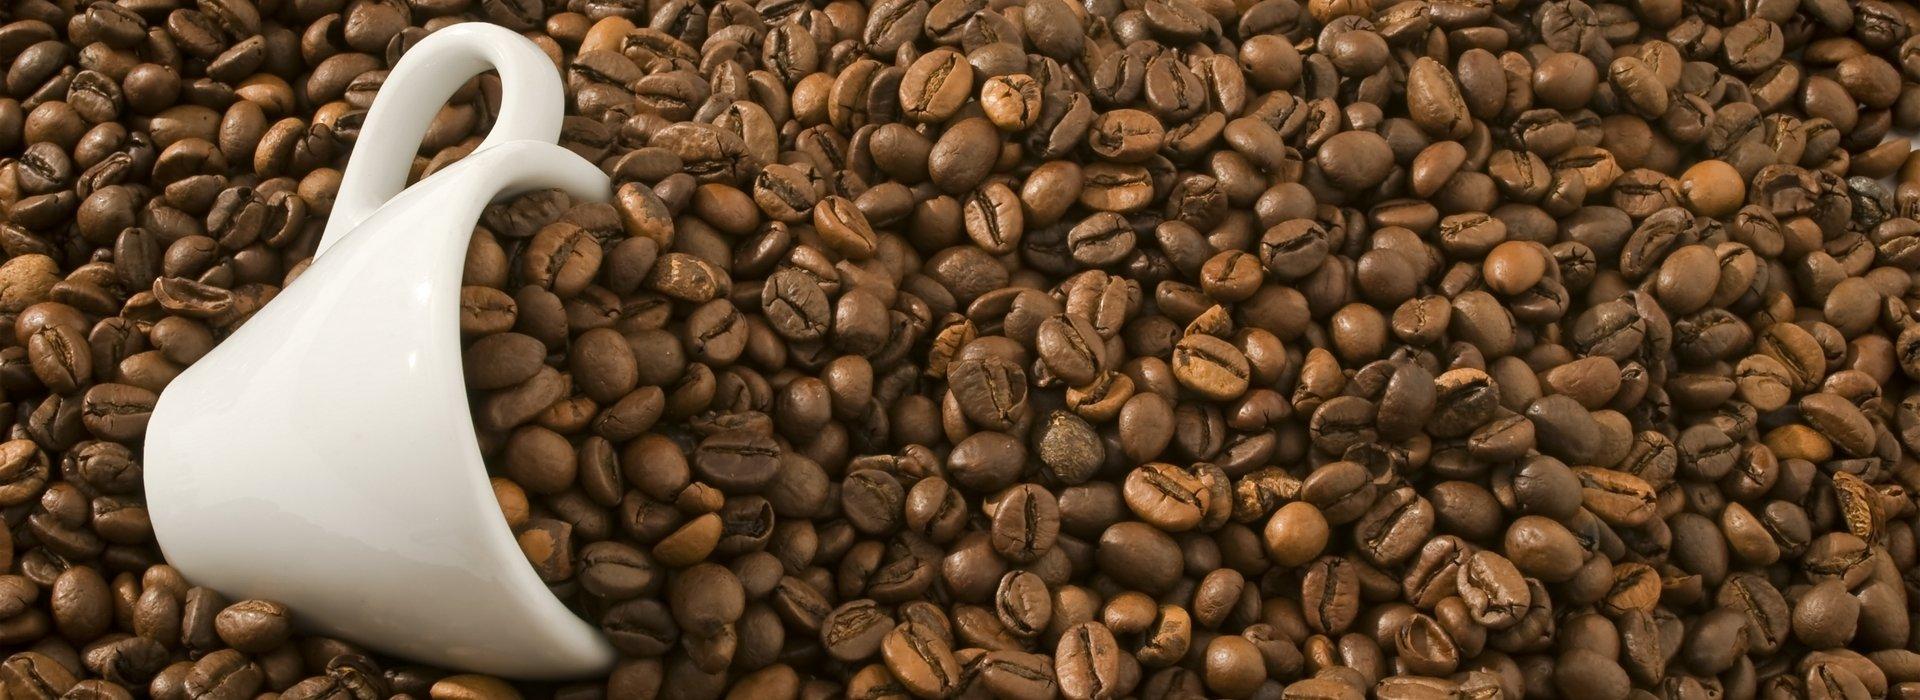 Cafés, Konditoreien